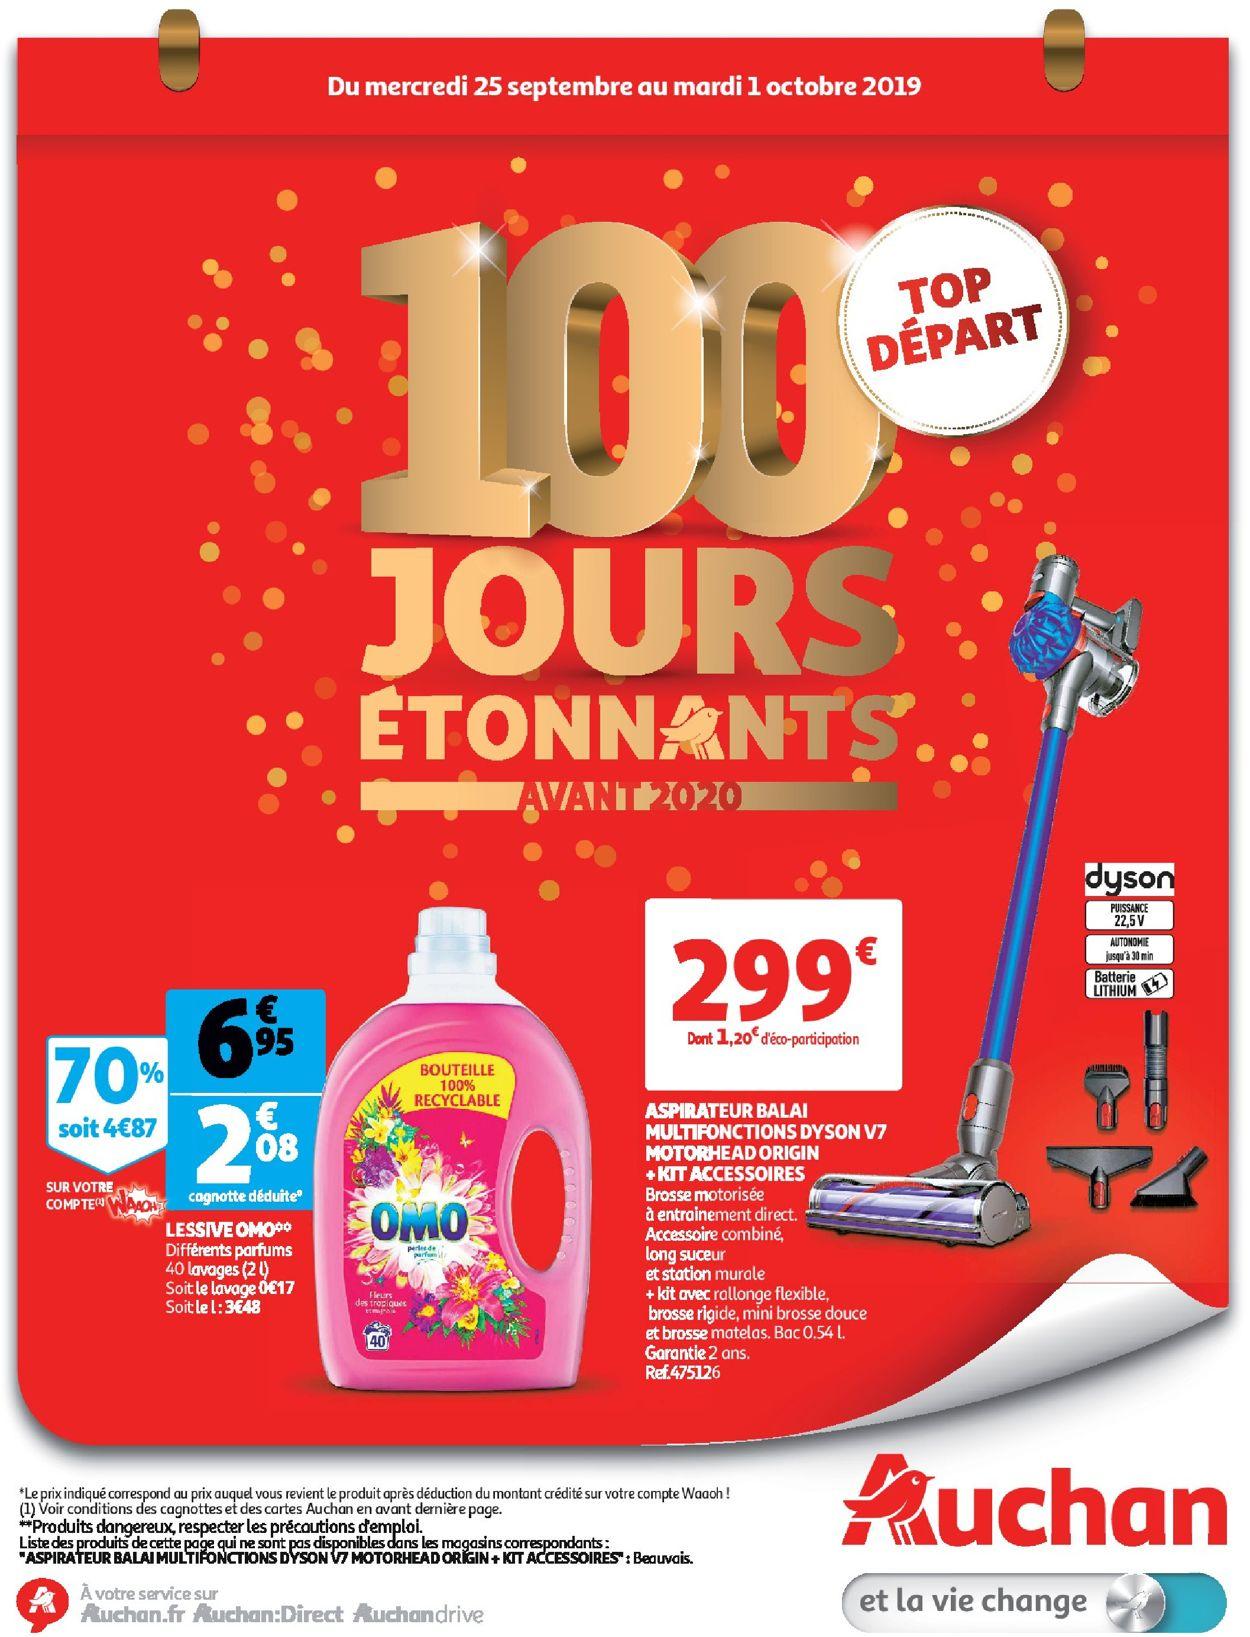 Auchan Catalogue - 25.09-01.10.2019